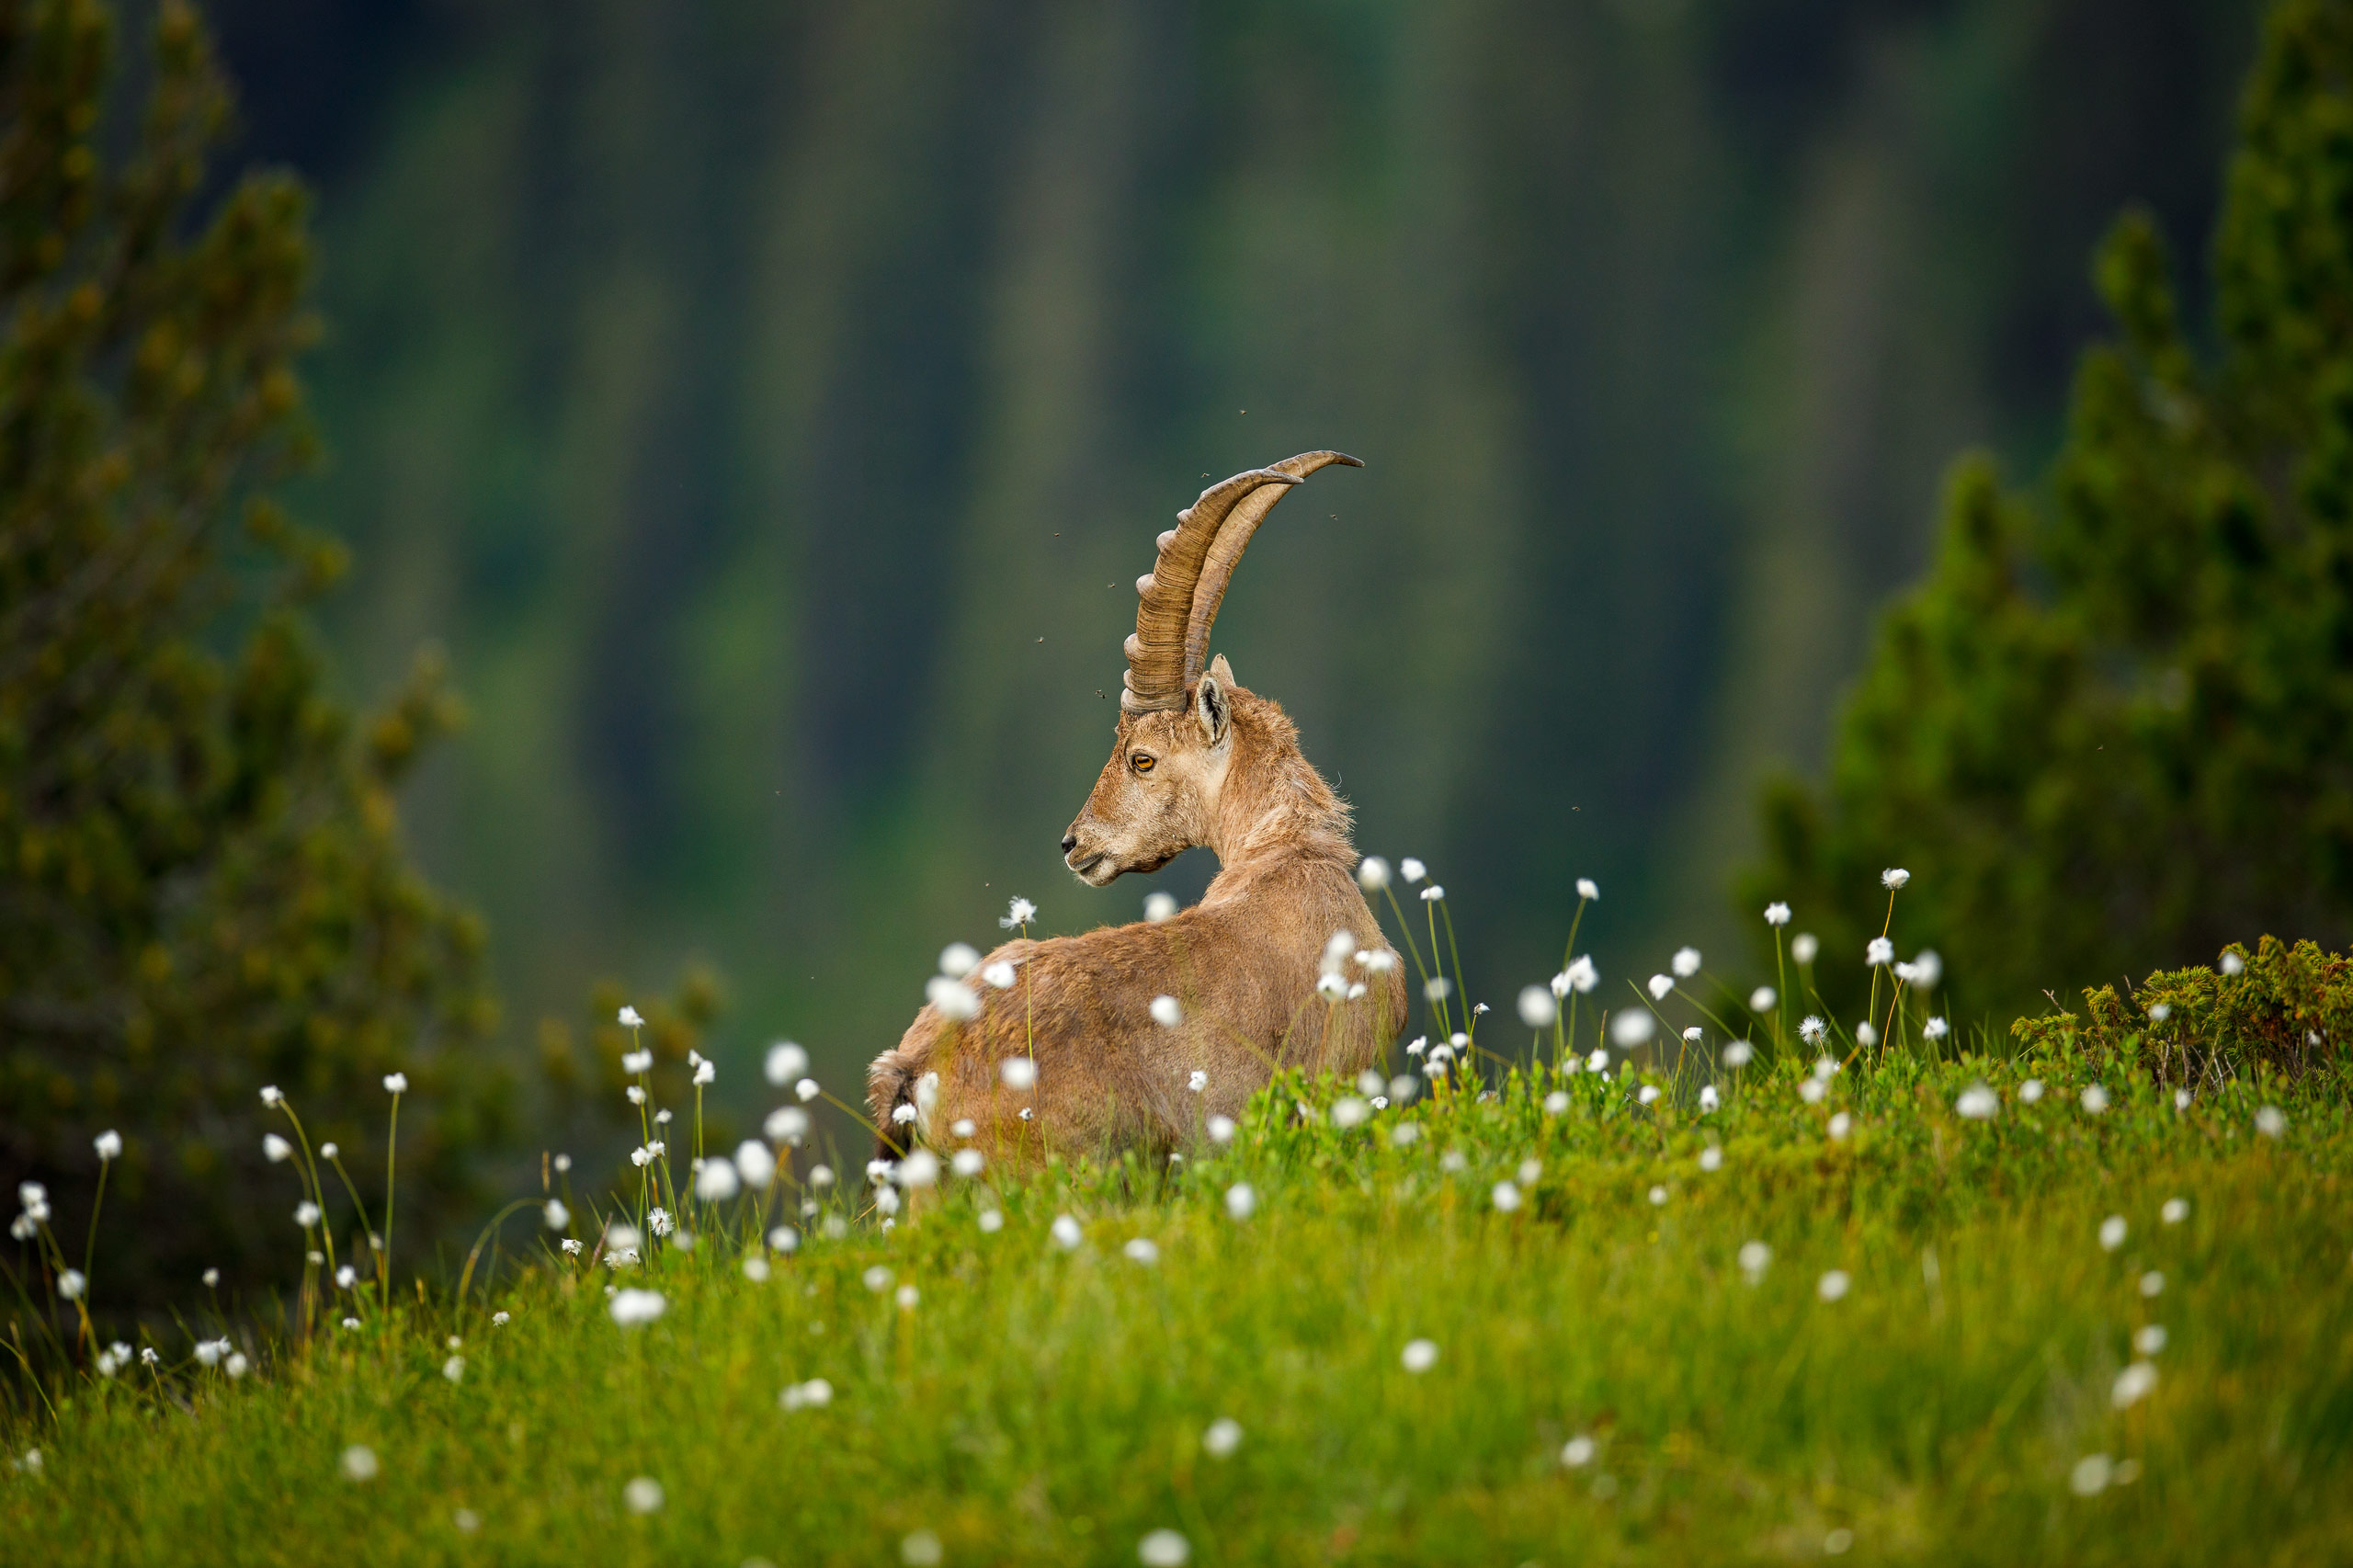 Tom_Schueler_Fotografie_Wildlife_Mammals_10